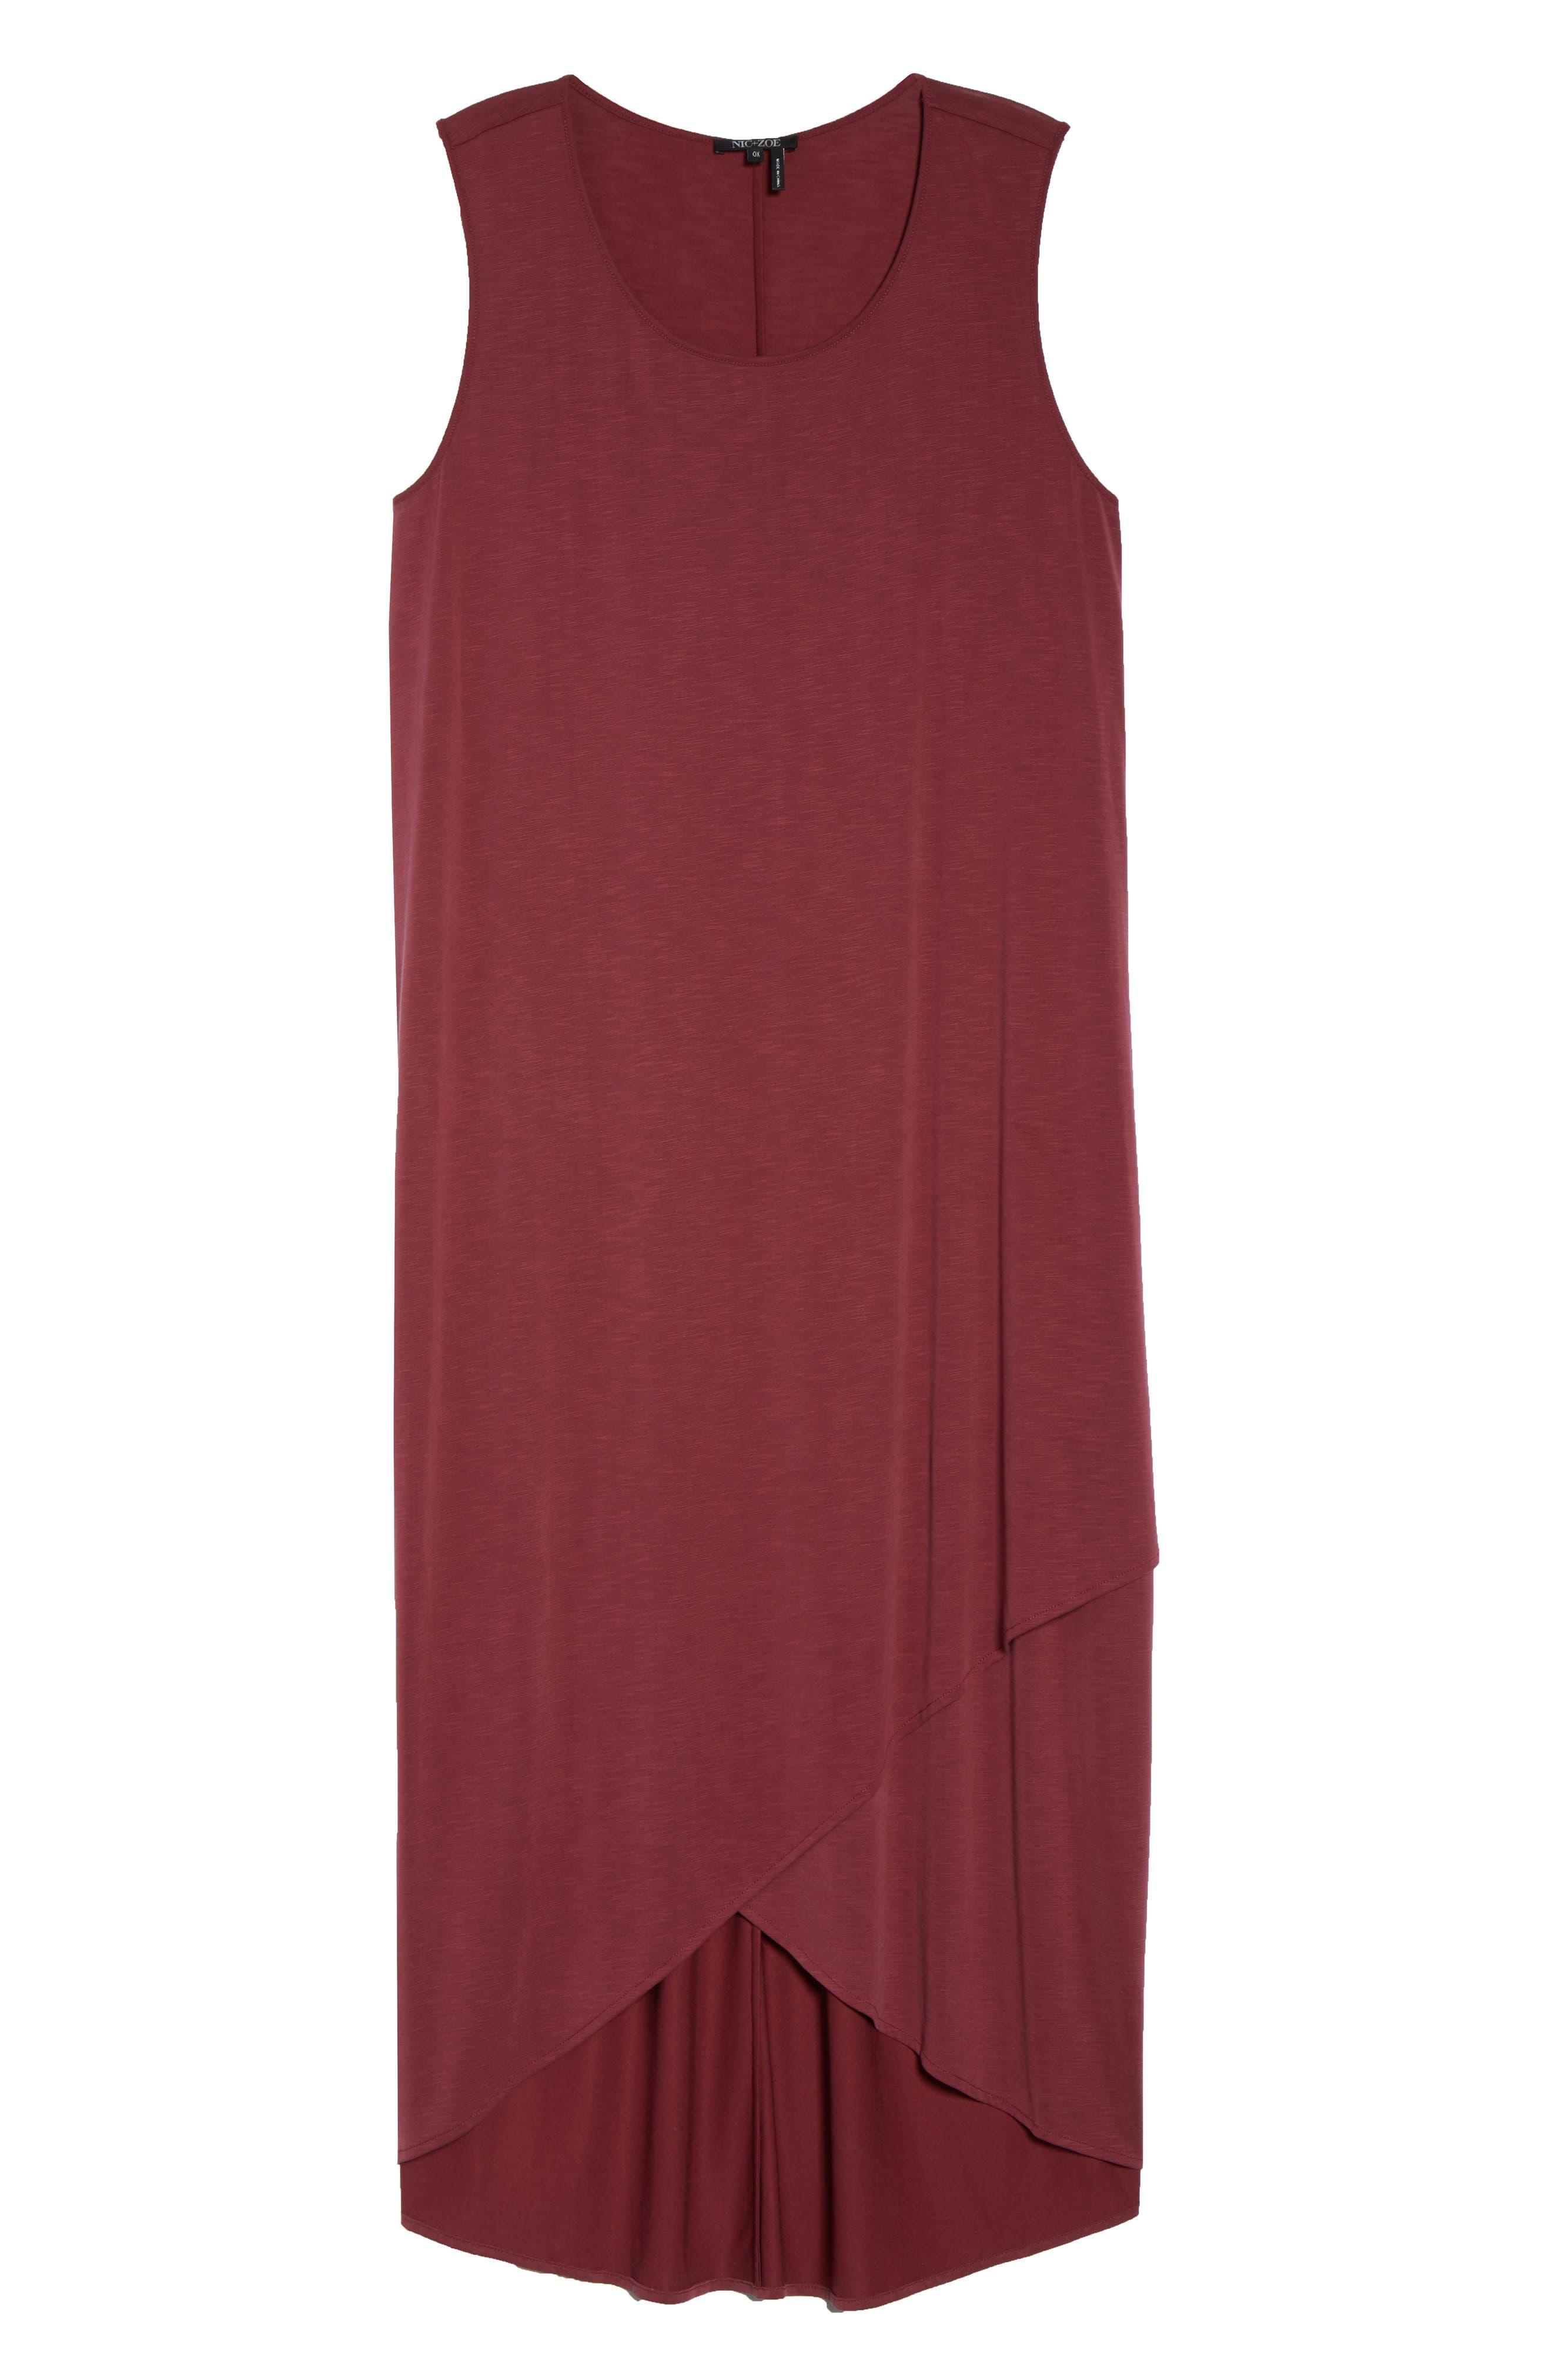 Boardwalk Jersey High/Low Dress,                             Alternate thumbnail 7, color,                             WASHED RAISIN